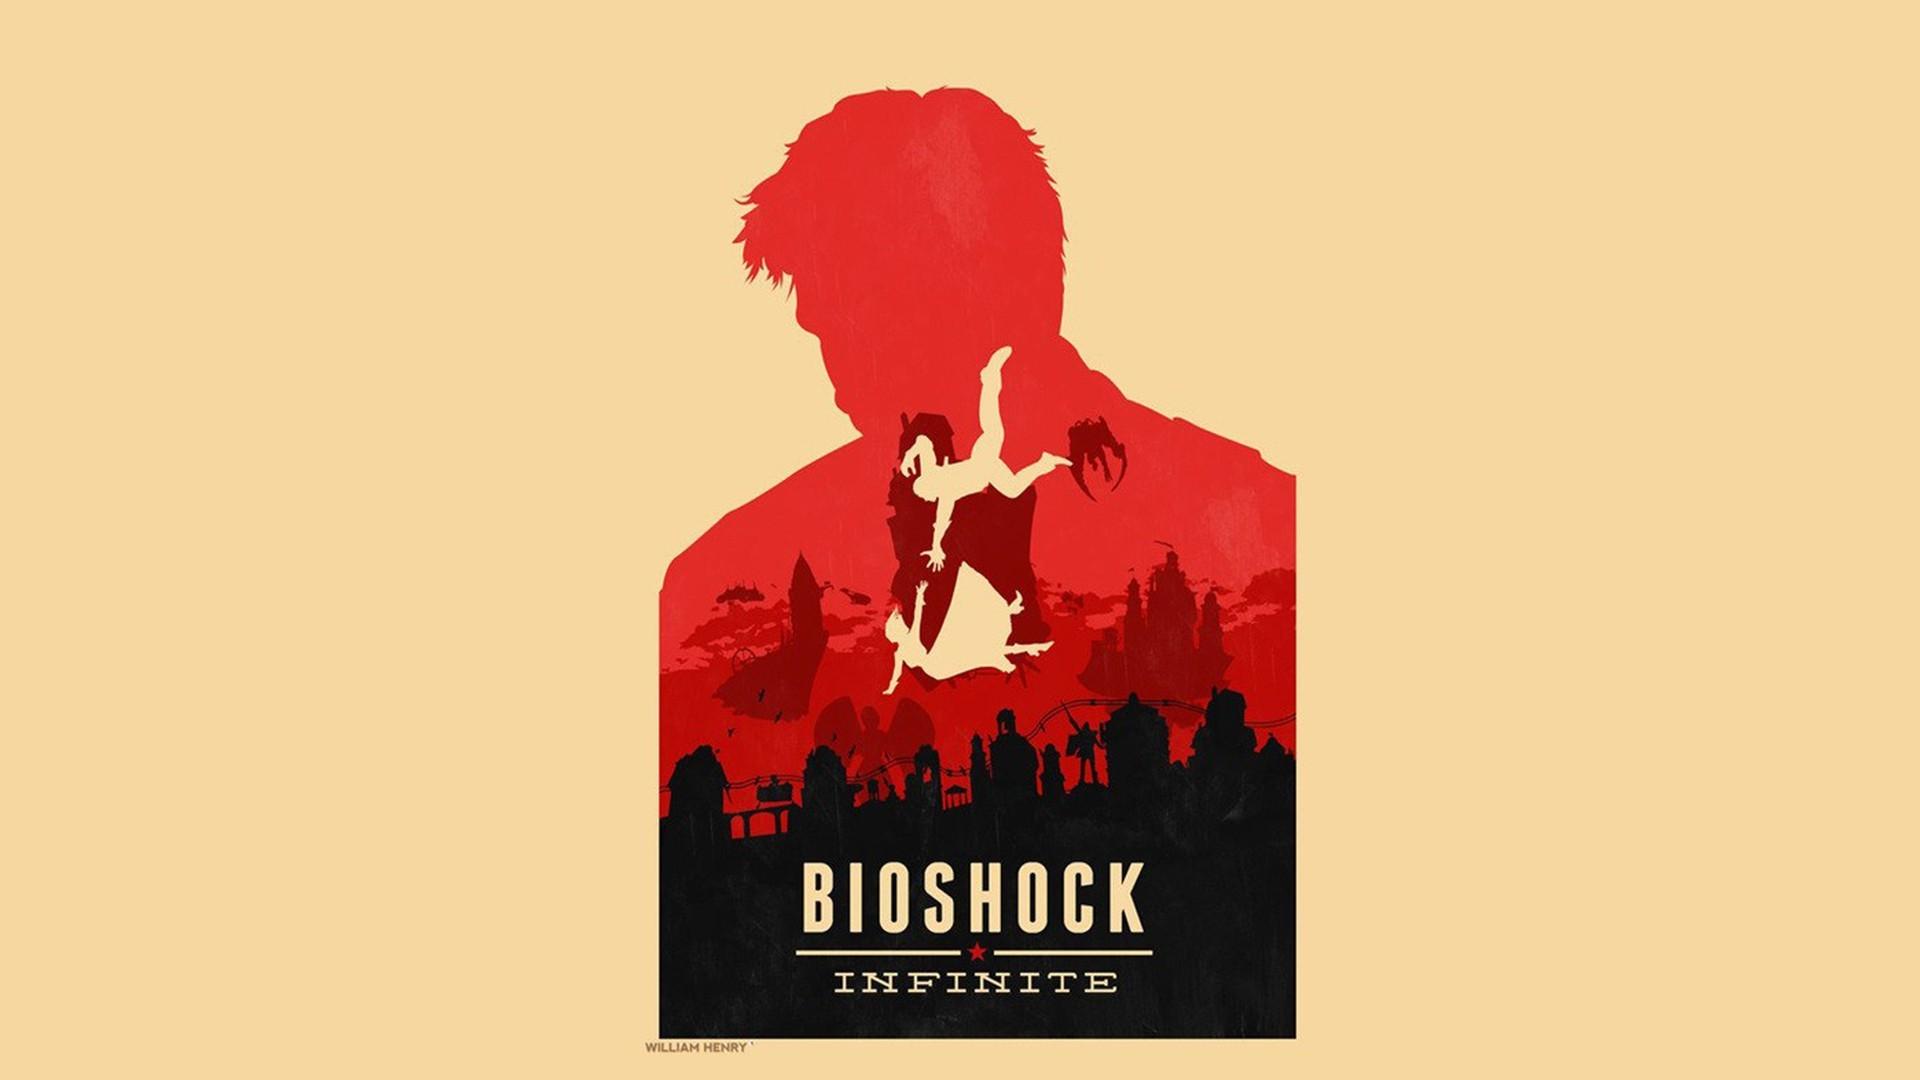 Desktop Bioshock HD Wallpapers.